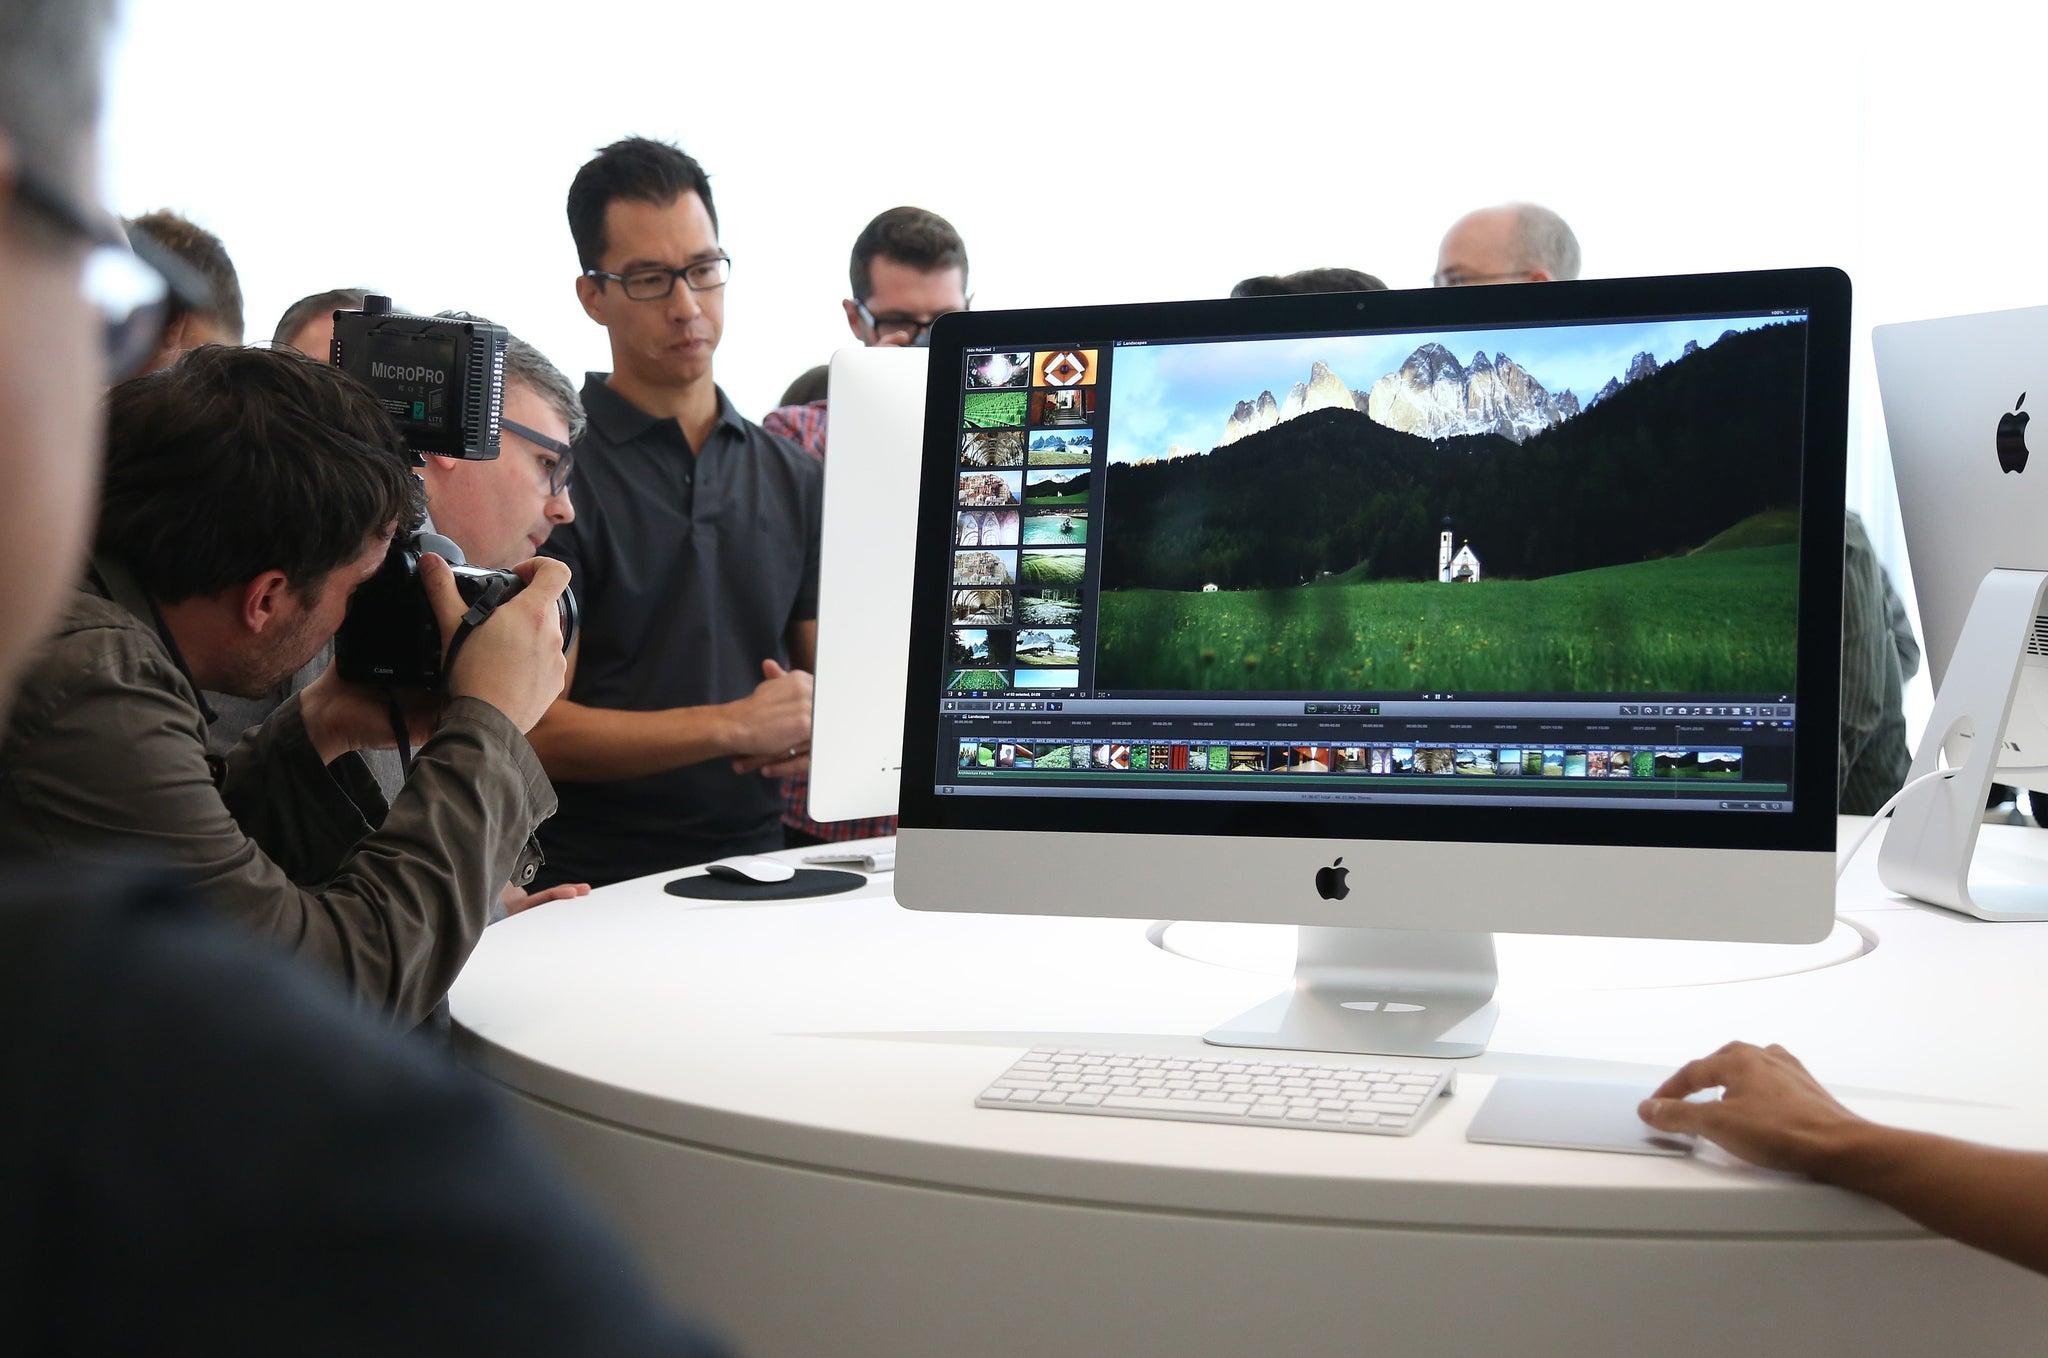 How to monitor anyone's computer: Mac OS X settings easily